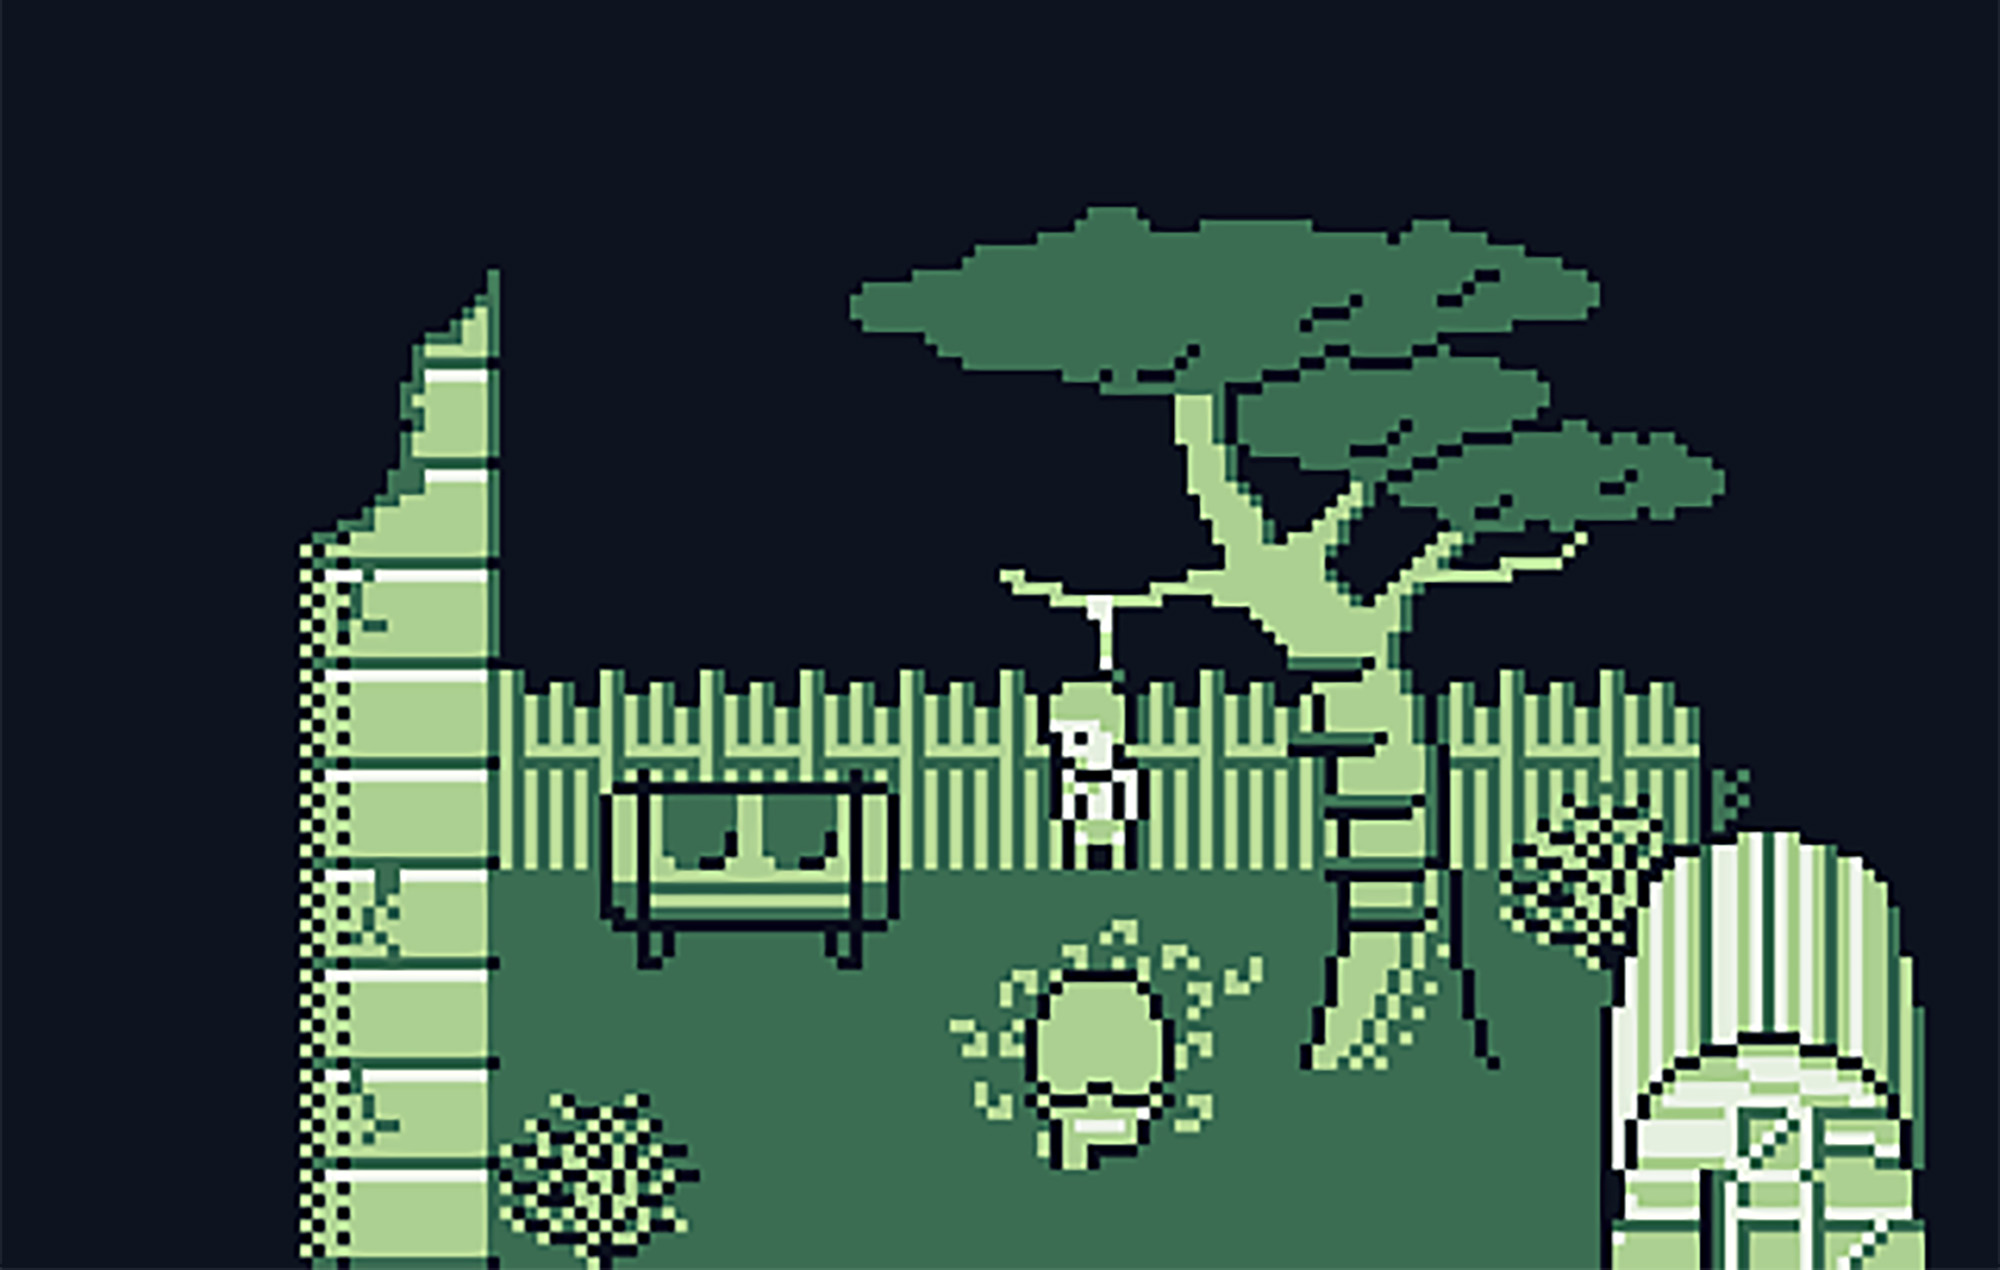 Disco Elysium: Game Boy Edition